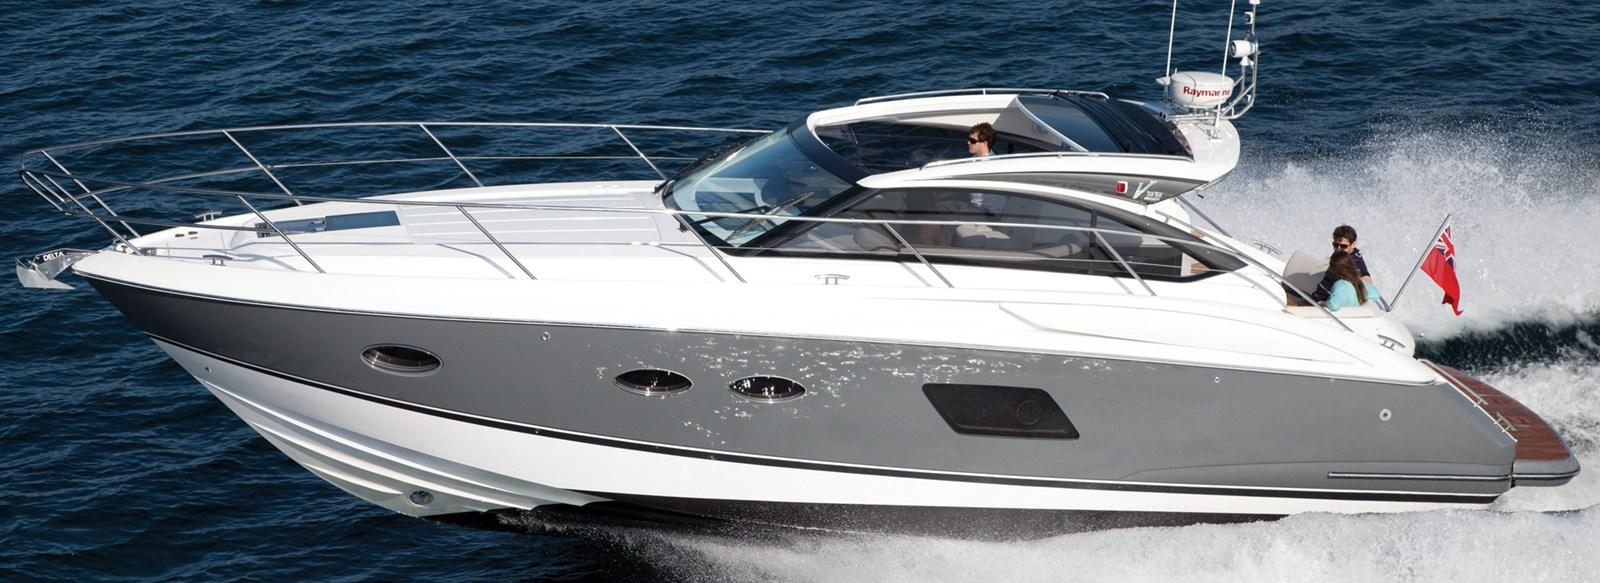 New Princess V39 Express Yachts For Sale